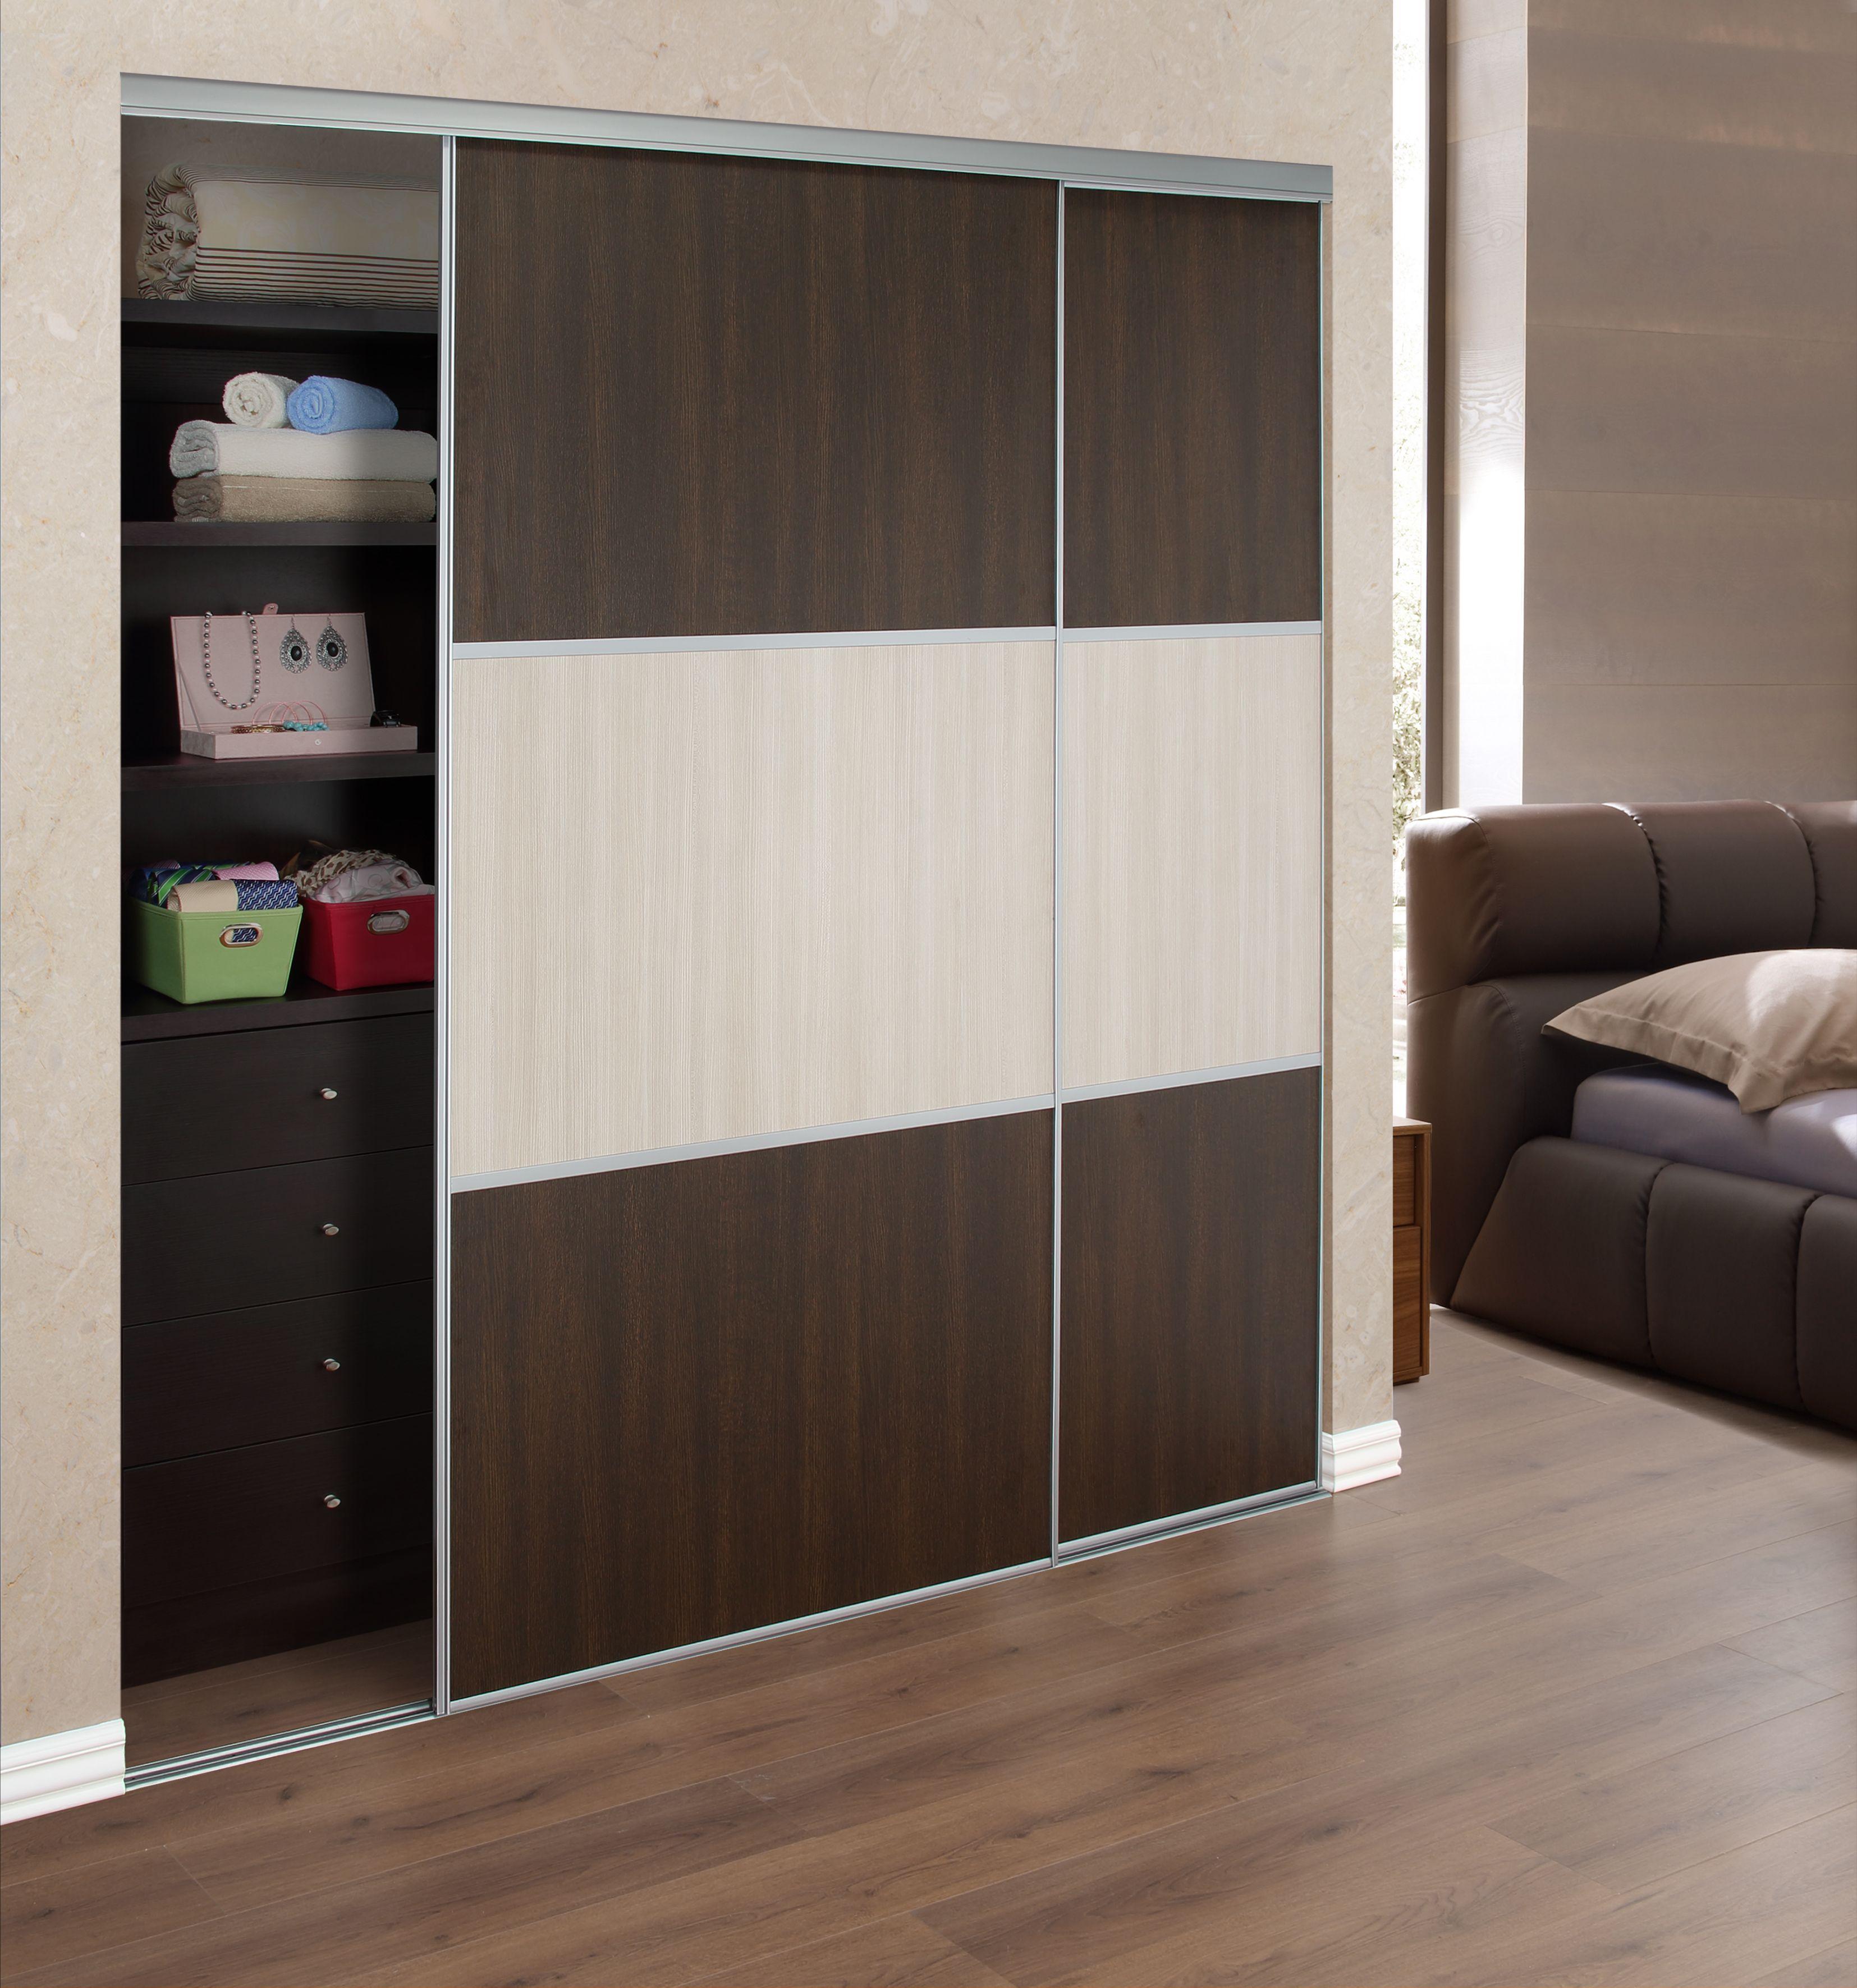 The 25 best puertas closet ideas on pinterest puertas for Puertas corredizas